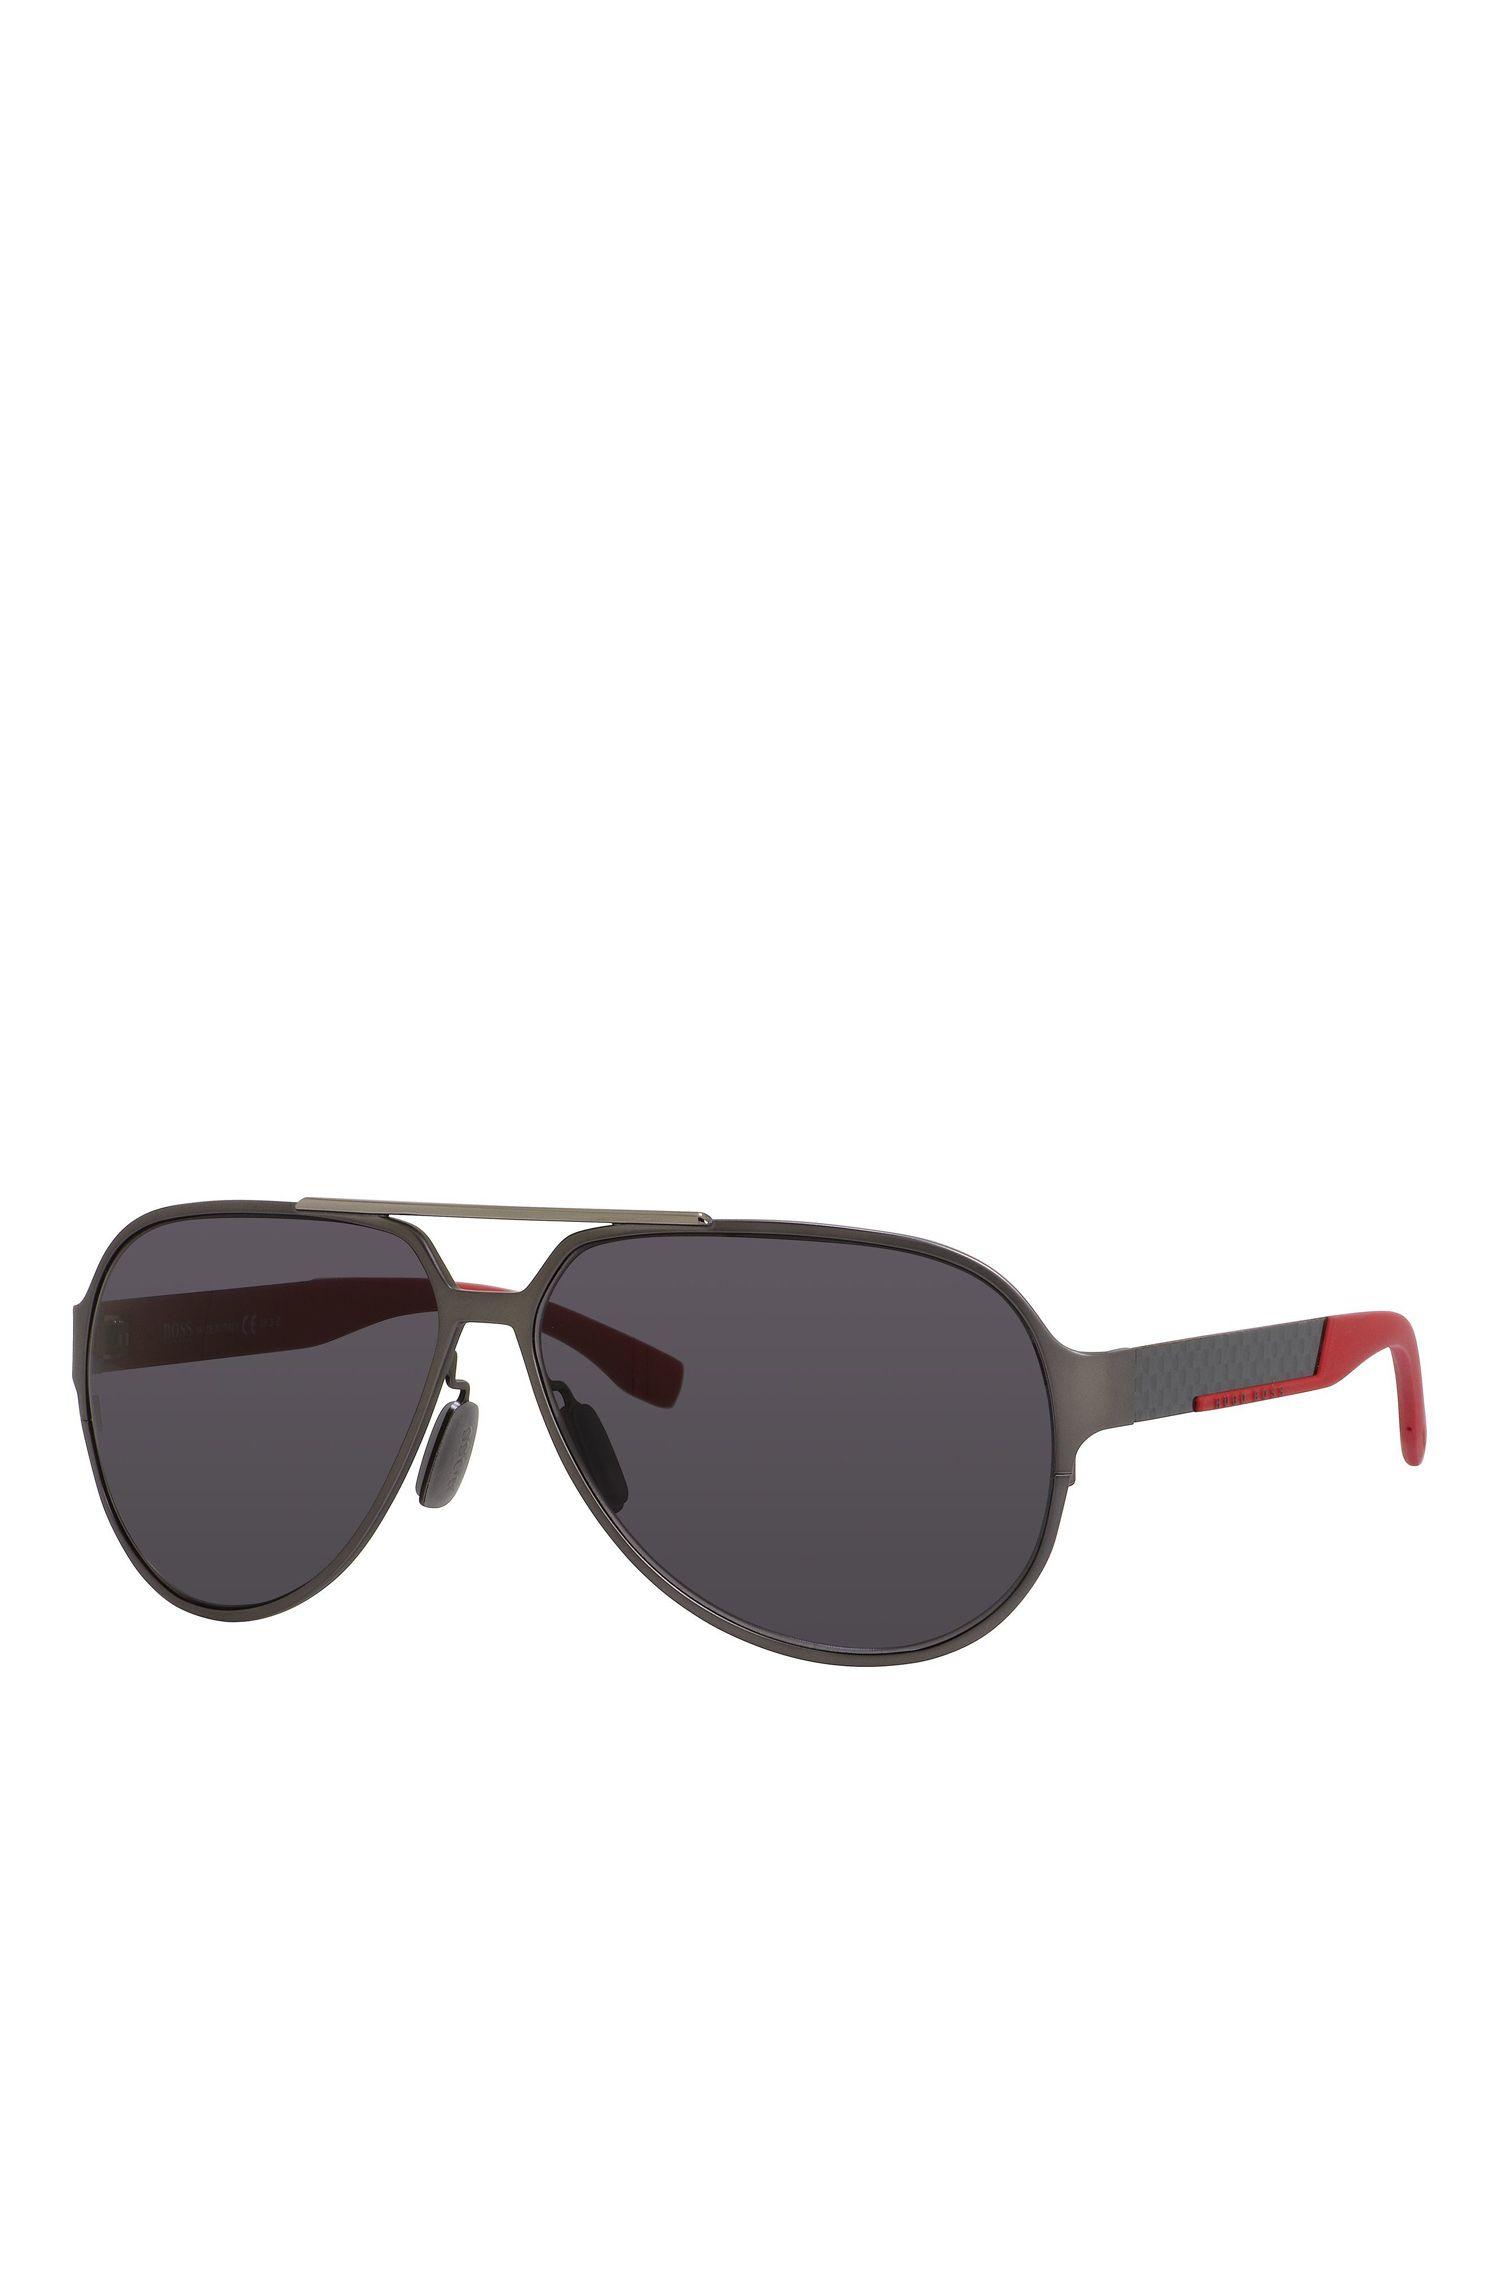 'BOSS  0669S' | Black Lens Carbon Fiber Aviator Sunglasses